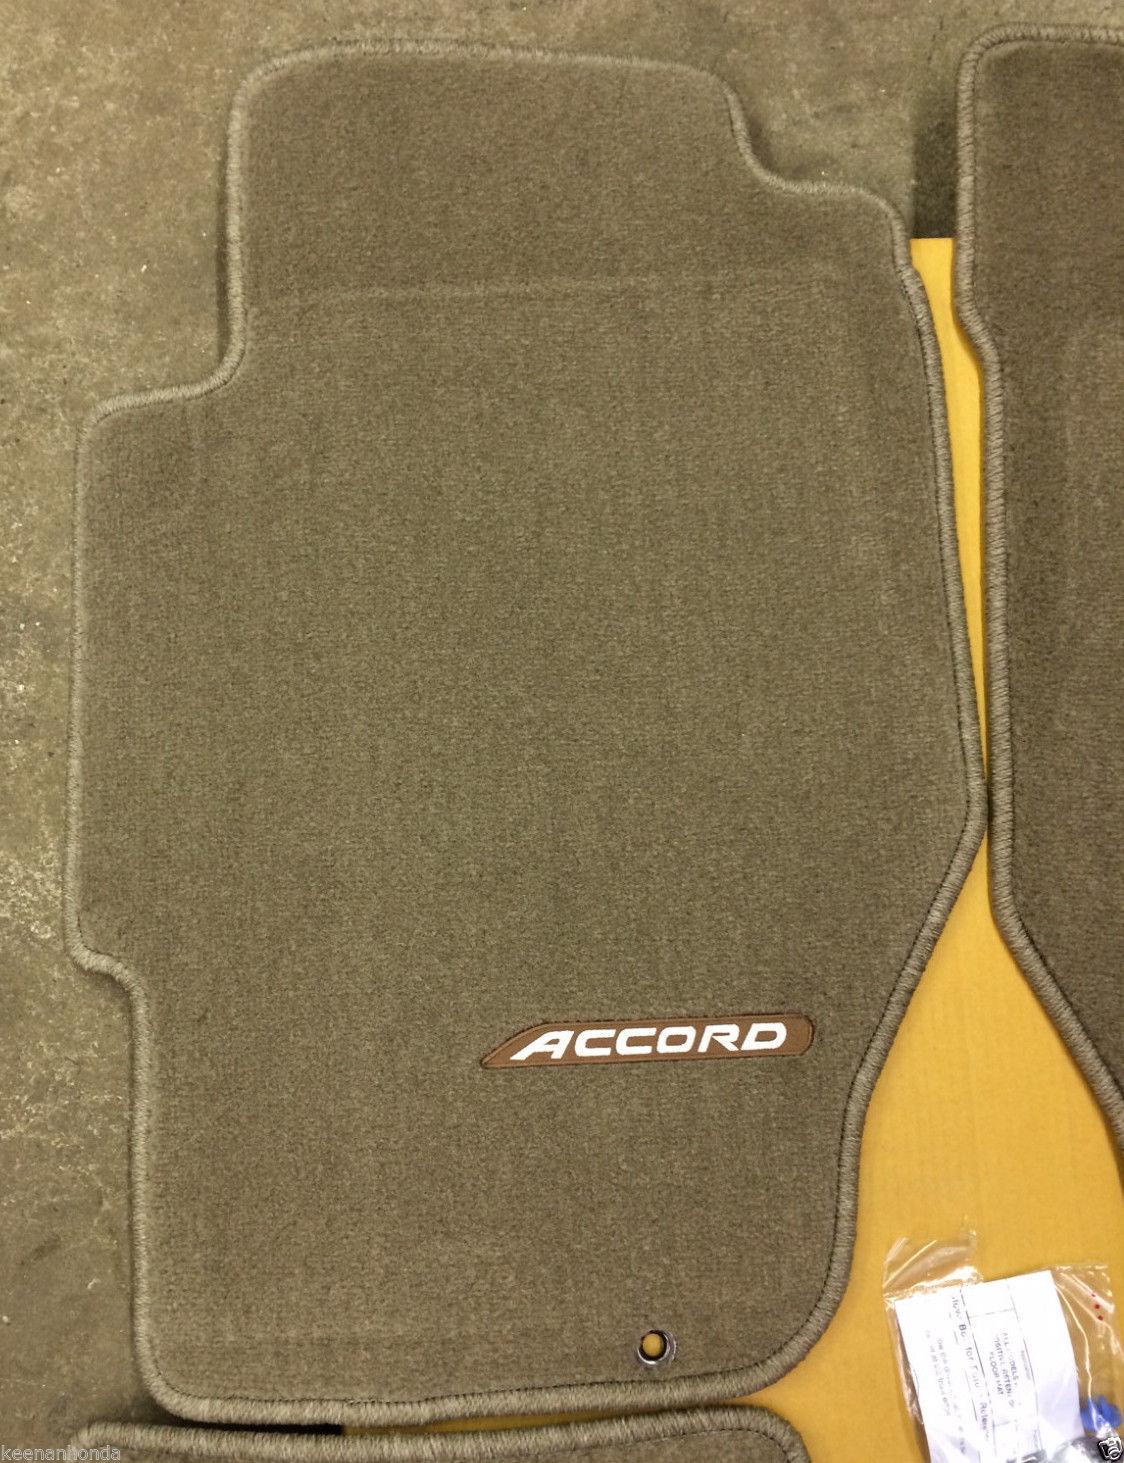 Honda Accord Sedan >> Amazing Genuine OEM Honda Accord 4dr Sedan Beige Tan Carpet Floor Mat Set 1998-2002 Mats 2017 ...